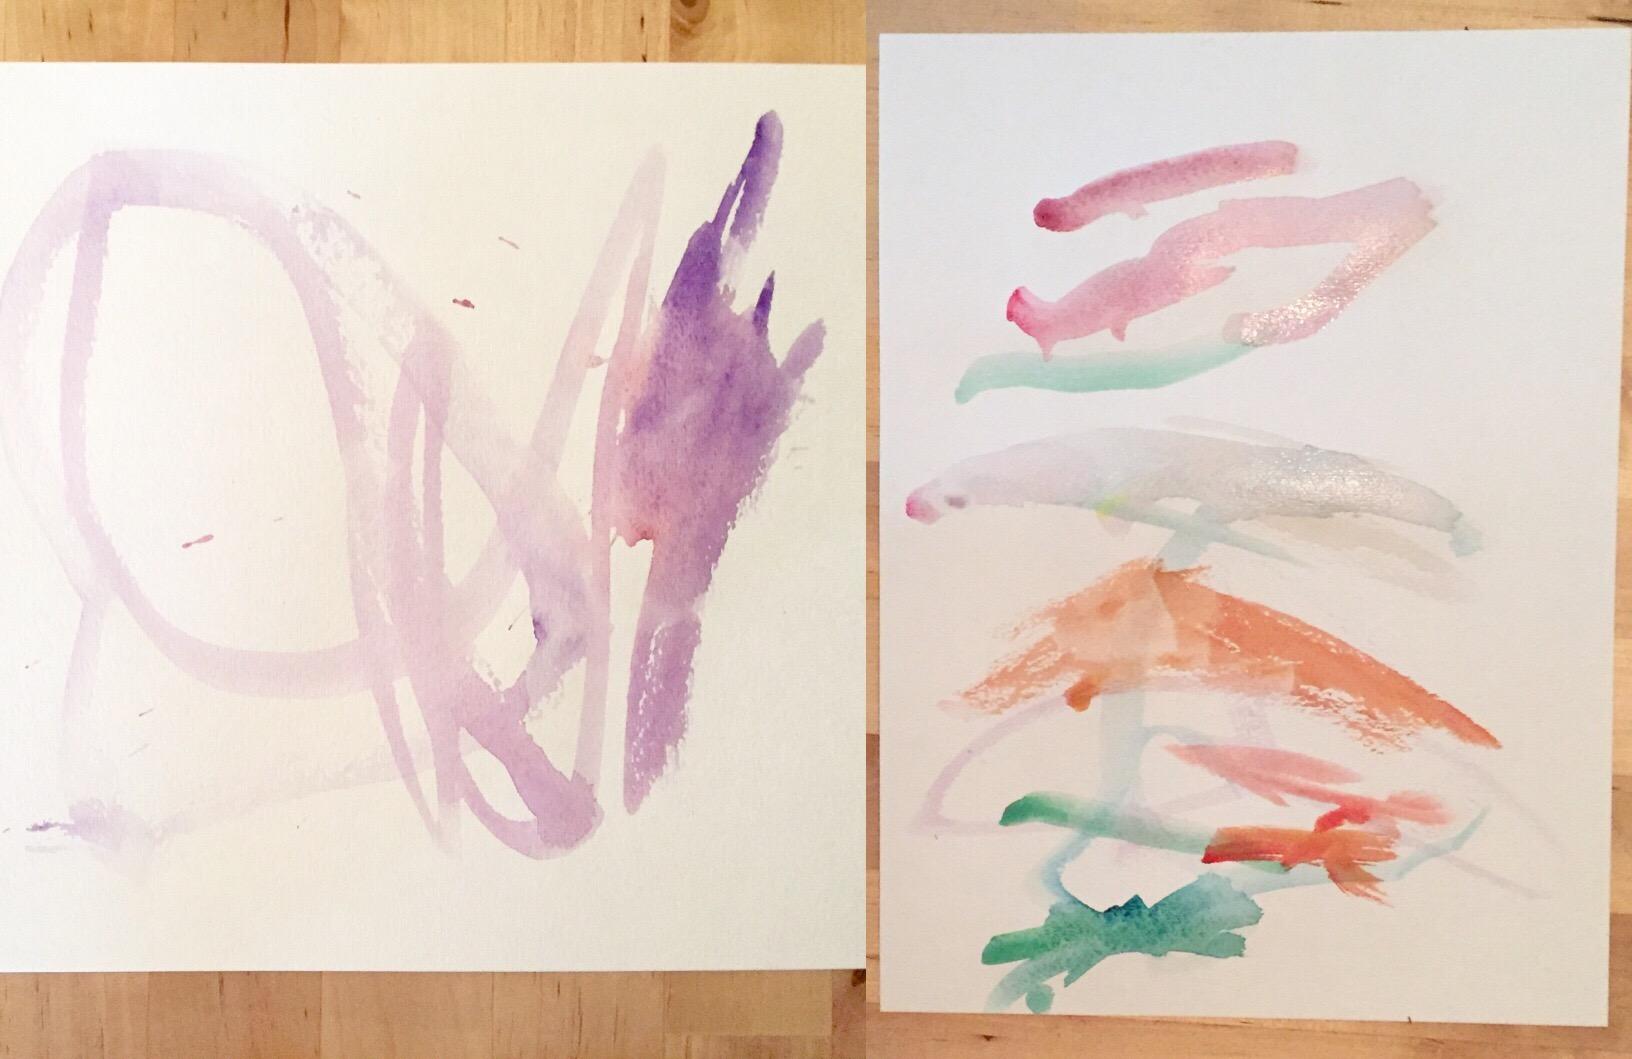 B's watercolors